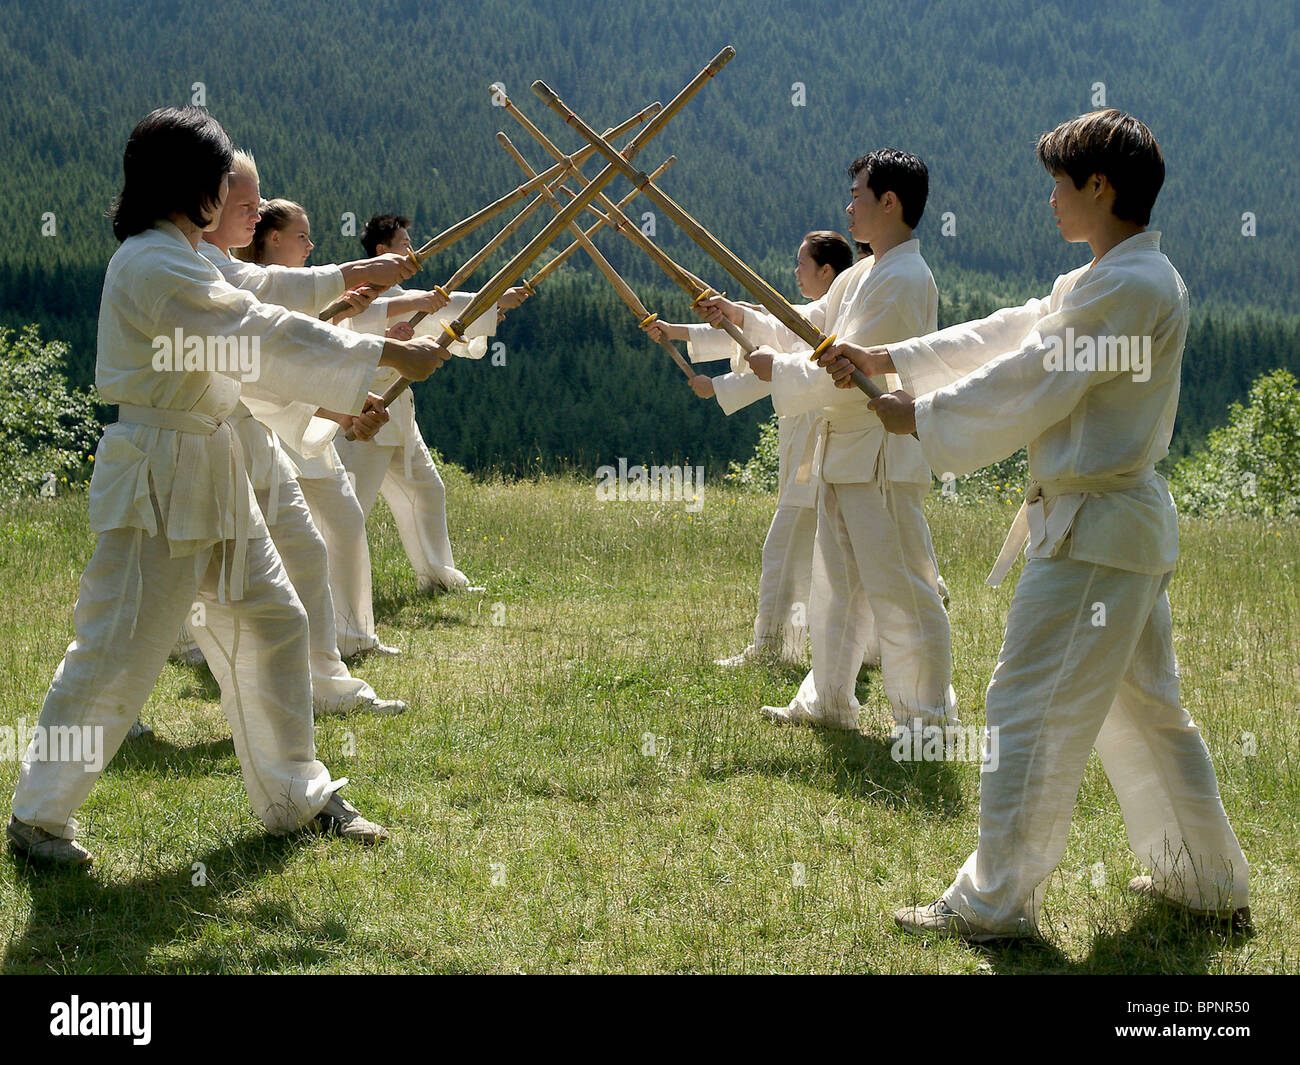 MARTIAL ARTS STUDENTS ELEKTRA (2005) - Stock Image